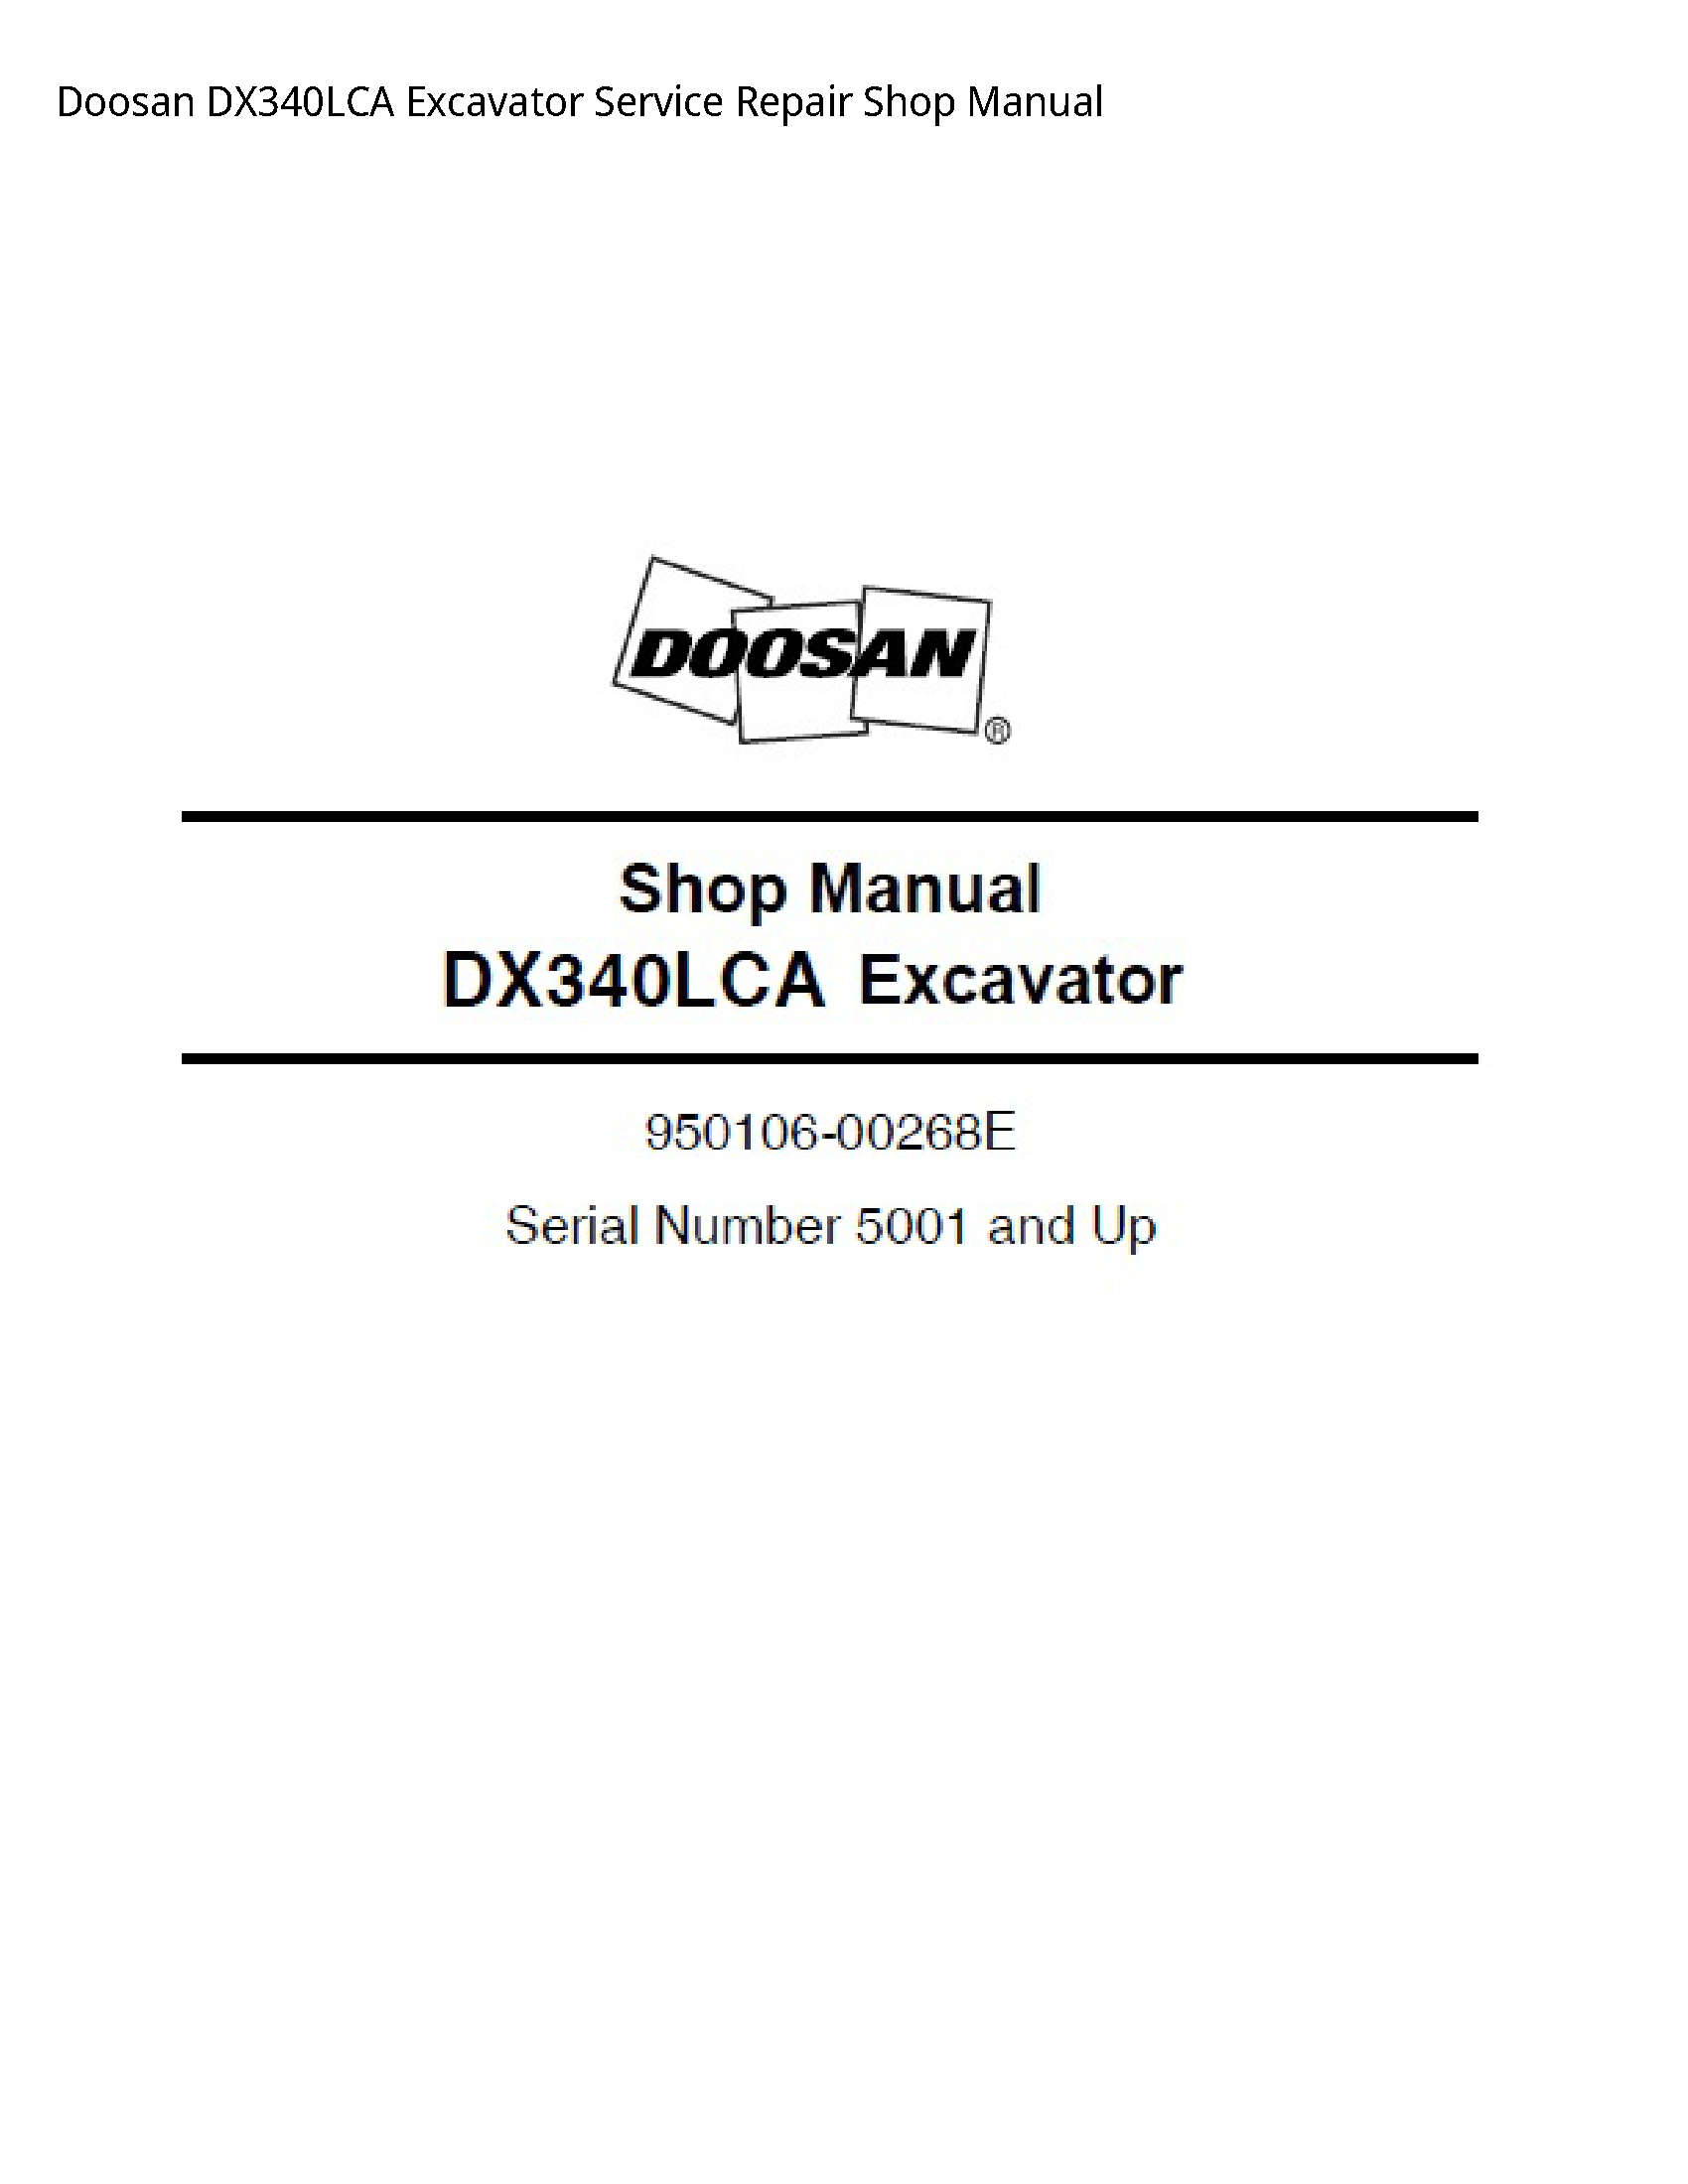 Doosan DX340LCA Excavator manual